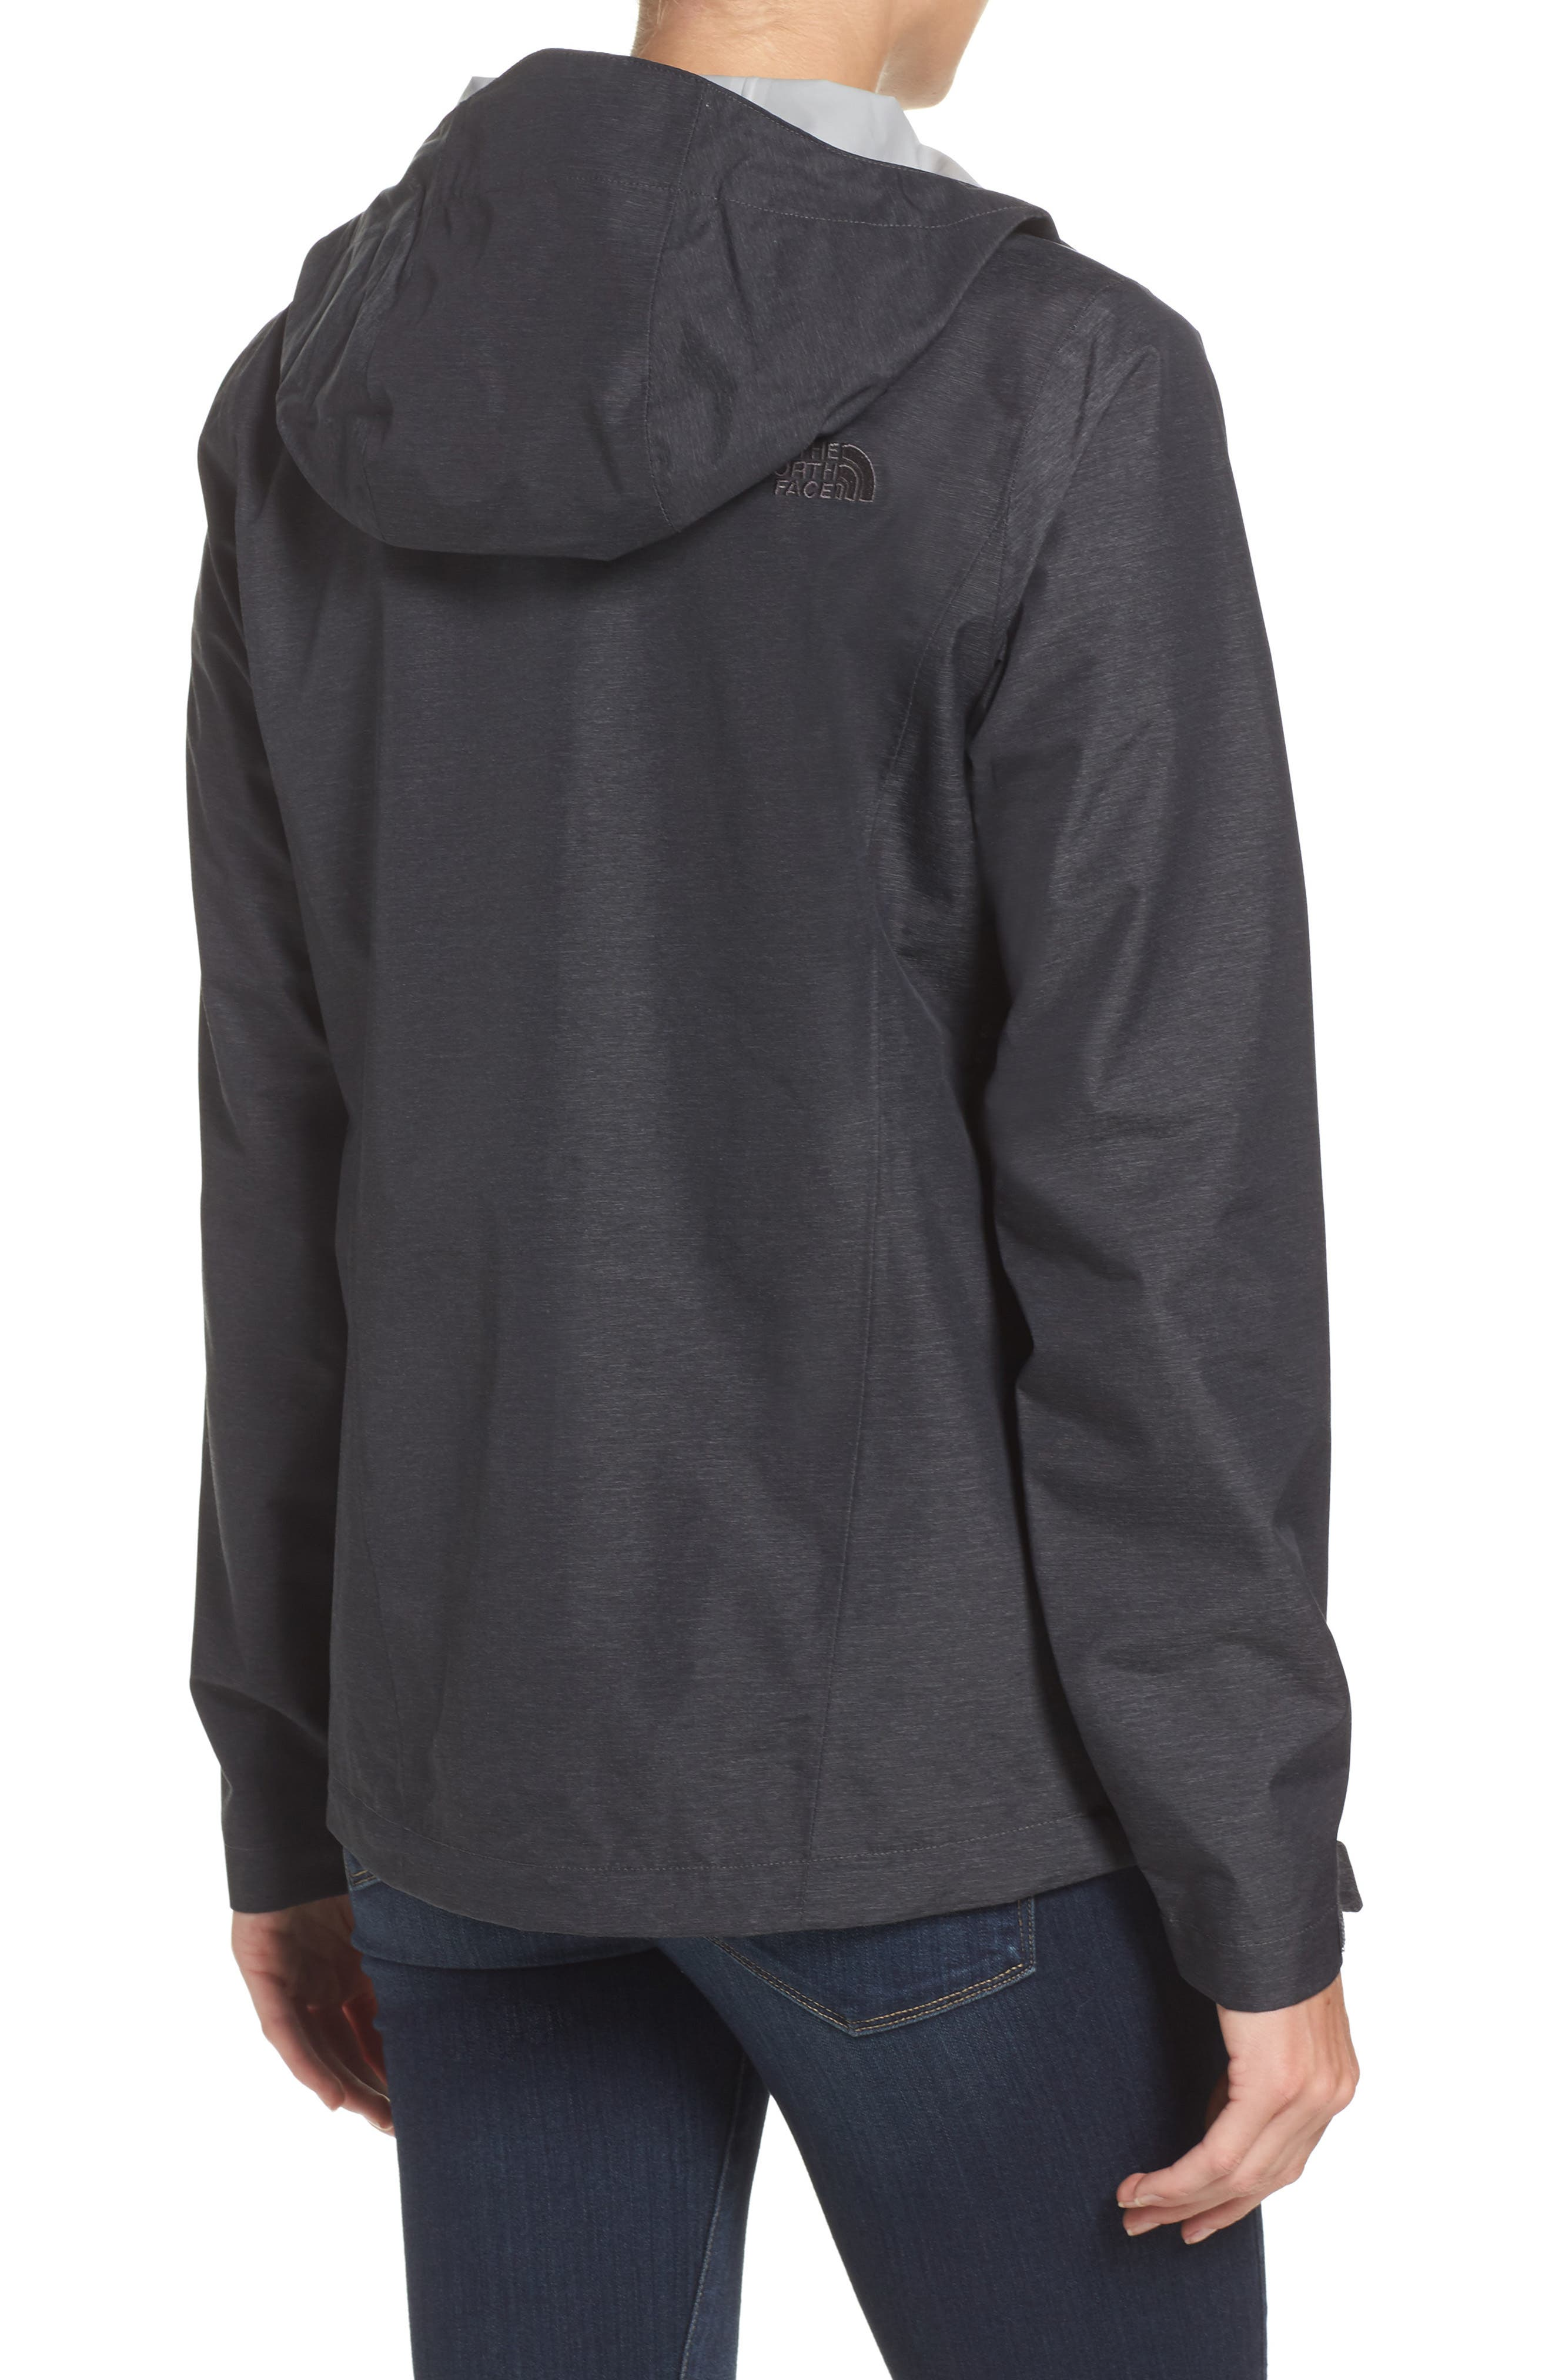 Venture 2 Waterproof Jacket,                             Alternate thumbnail 2, color,                             TNF DARK GREY HEATHER